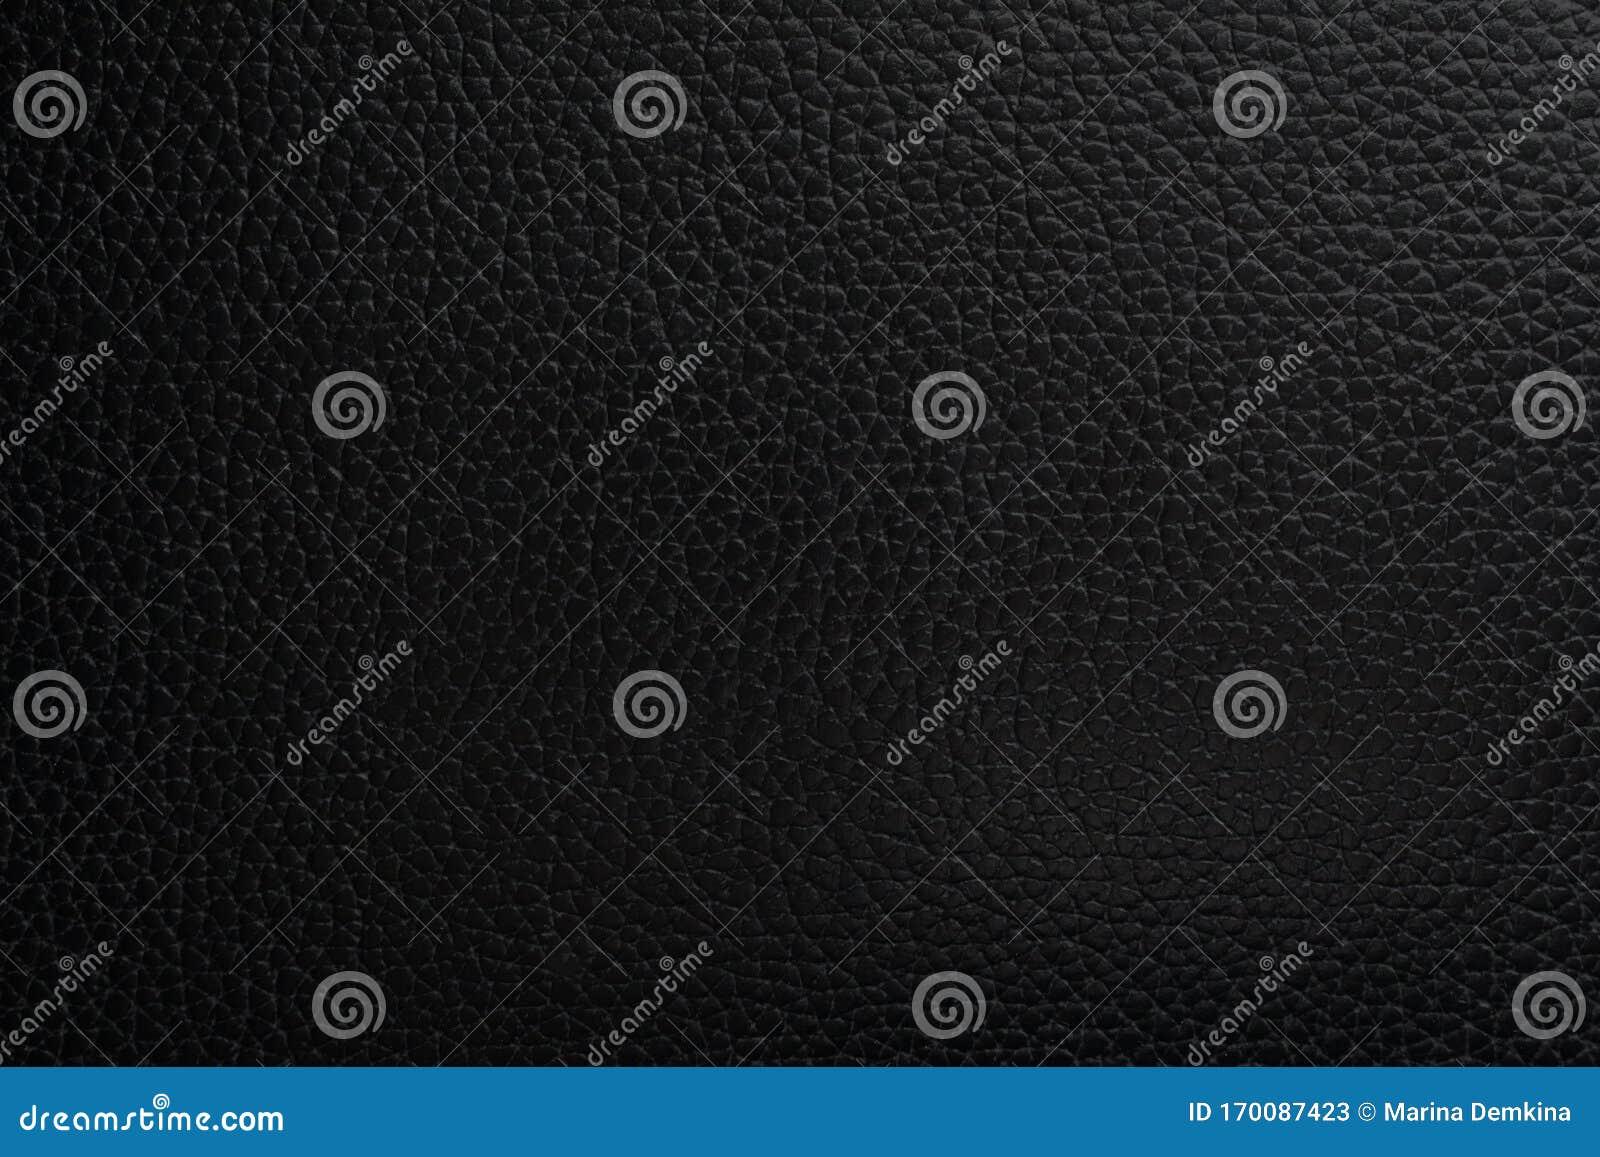 Closeup of vintage leather texture | Stock image | Colourbox